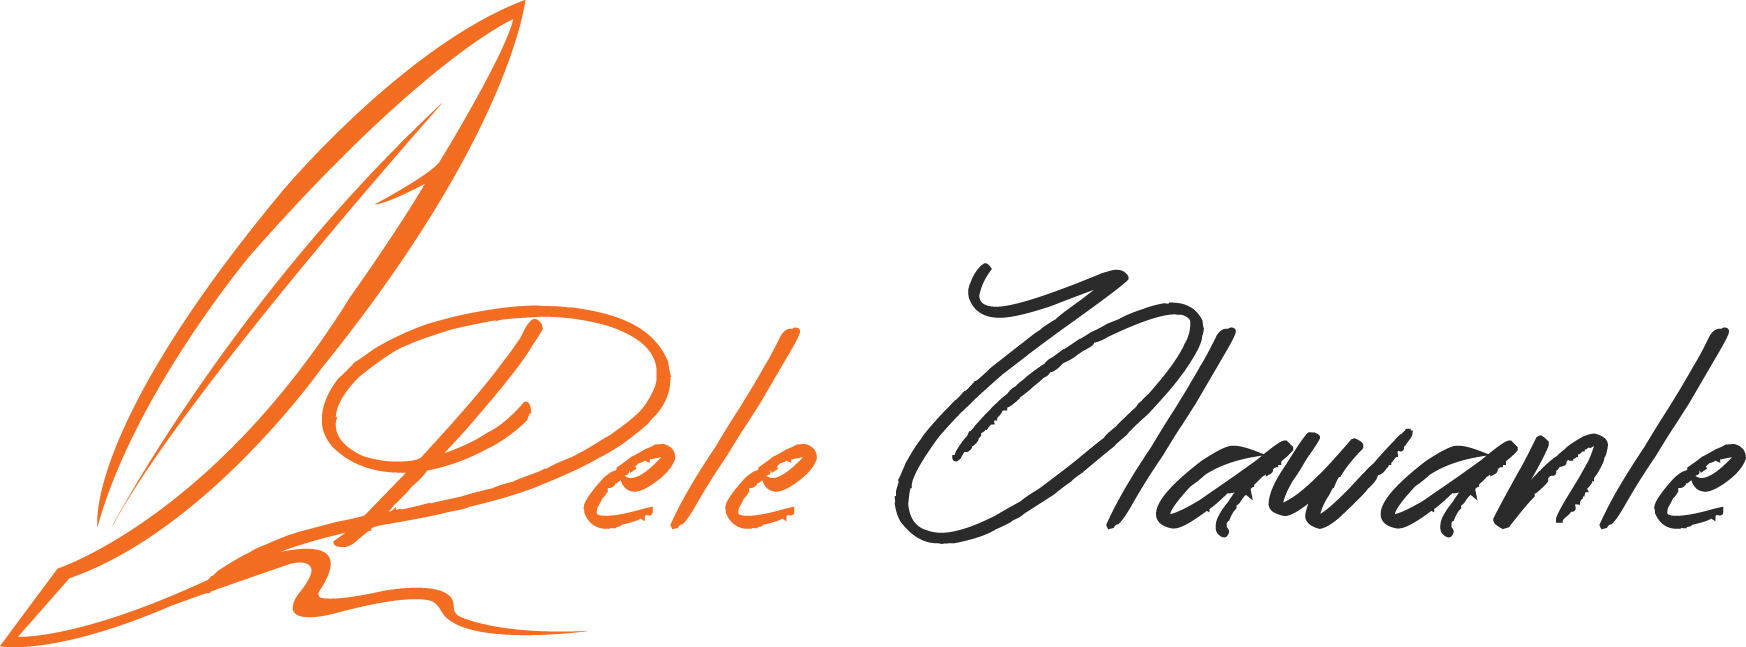 Pastor Dele Olawanle